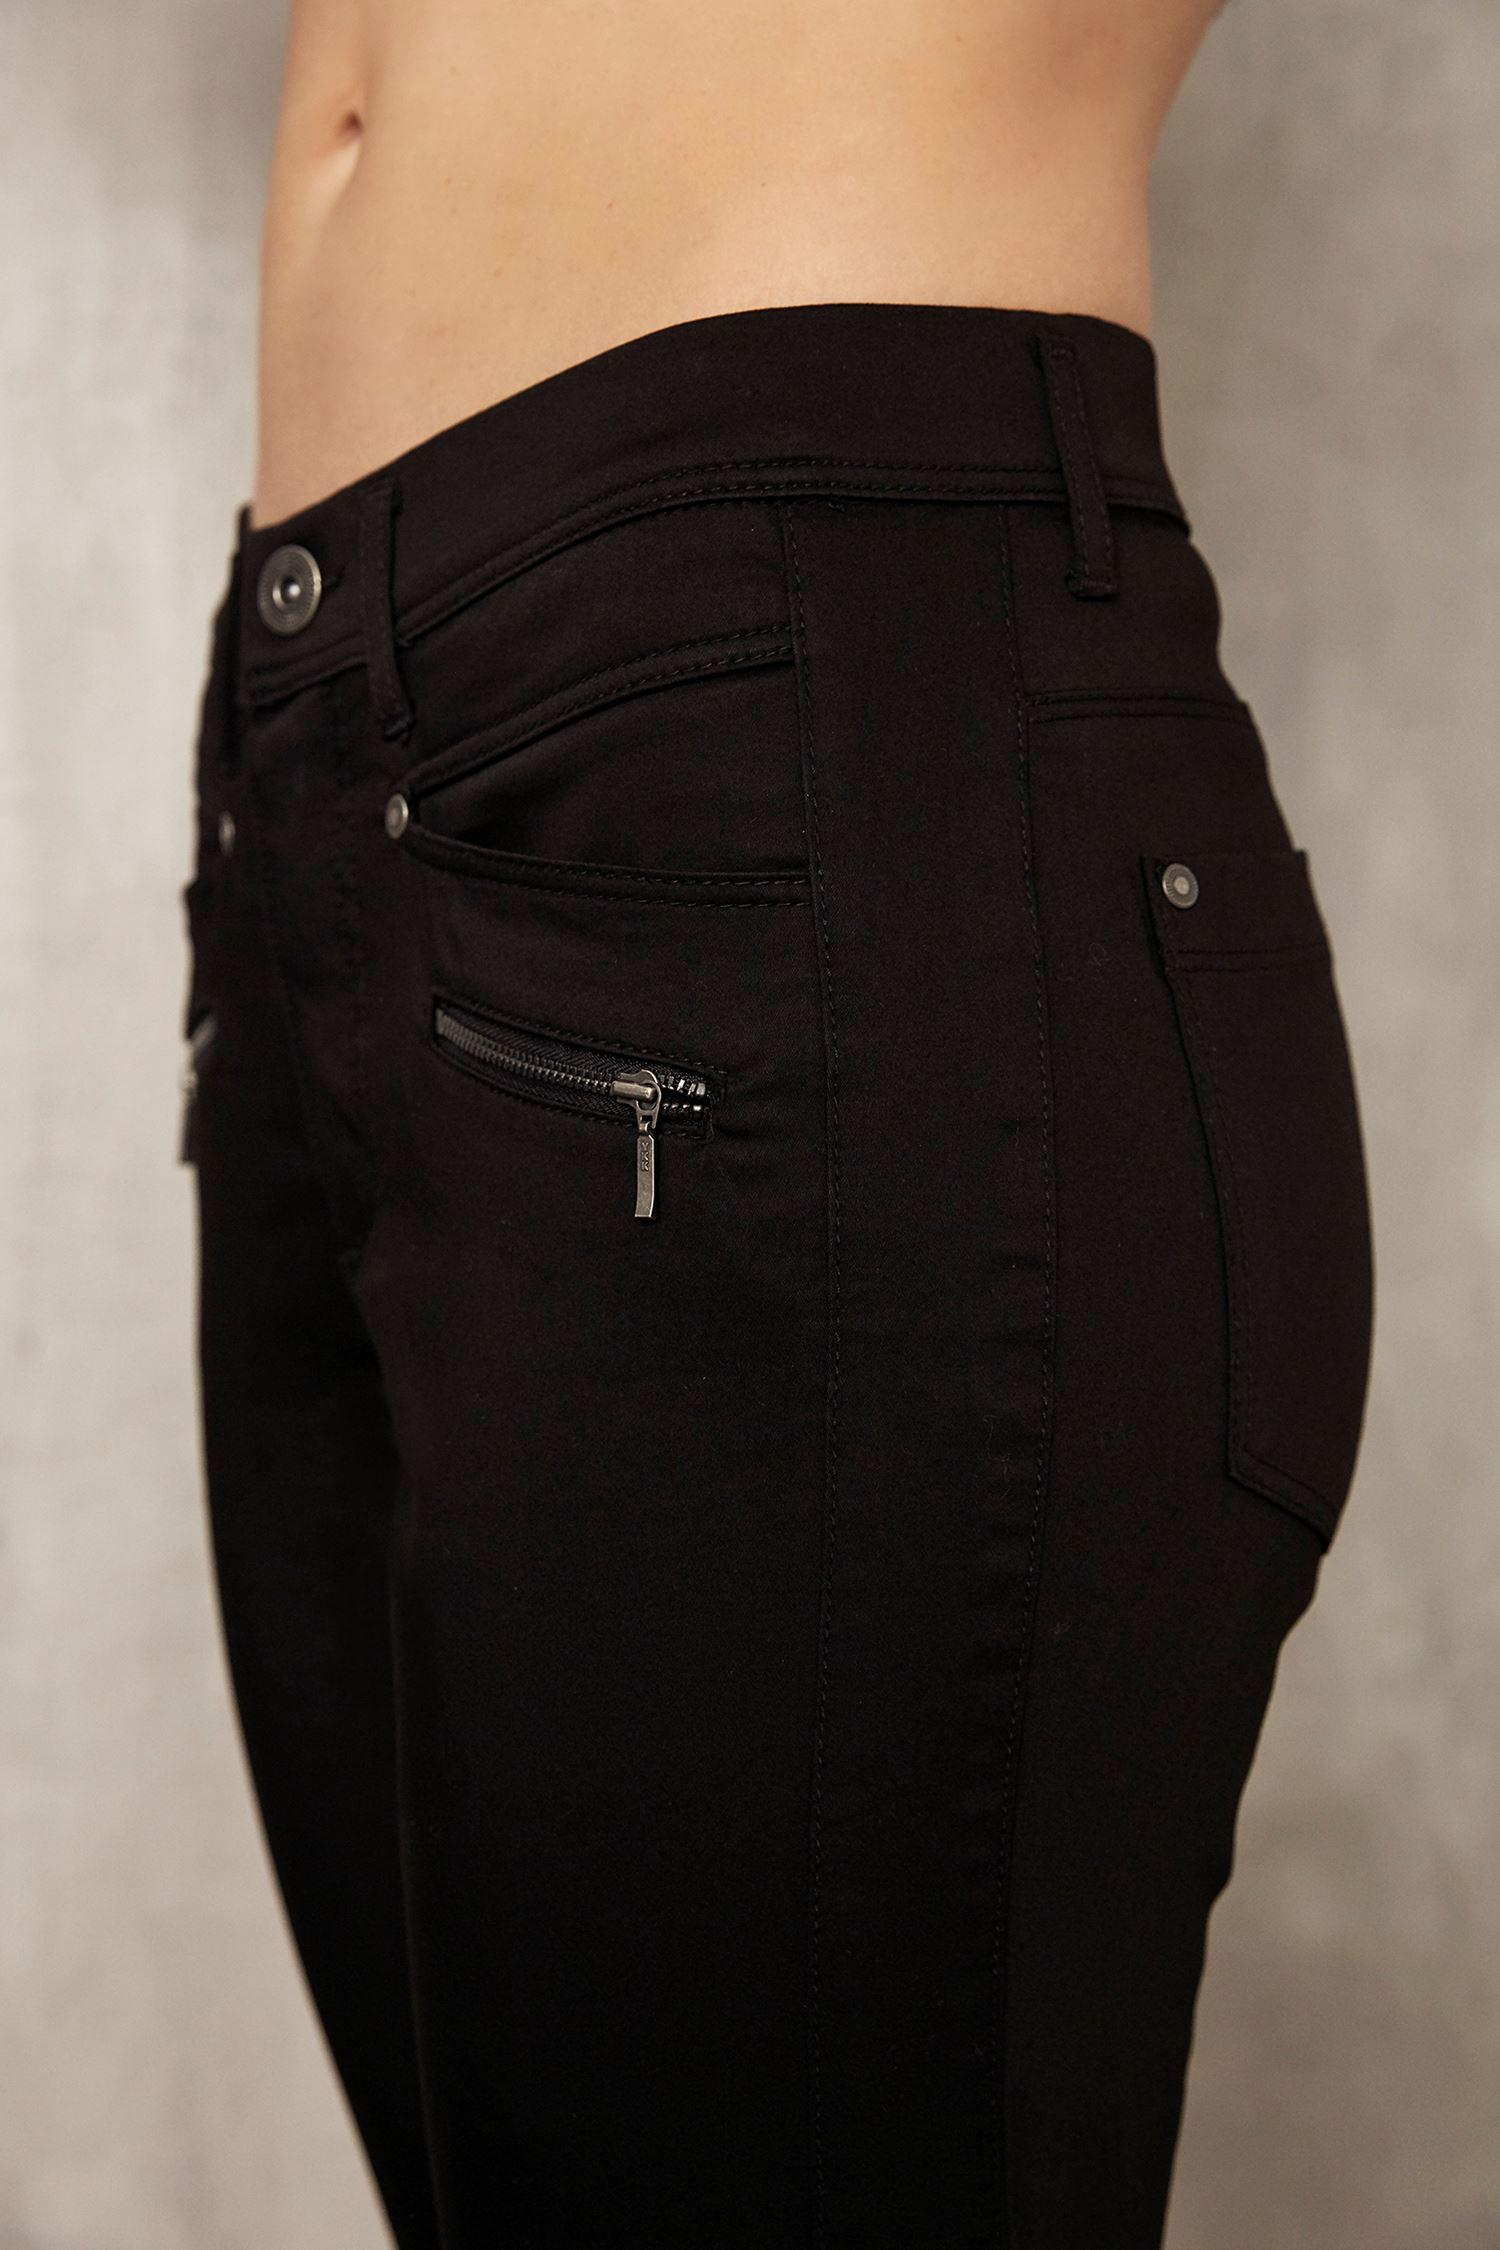 2-Biz Rany pants, black, 44